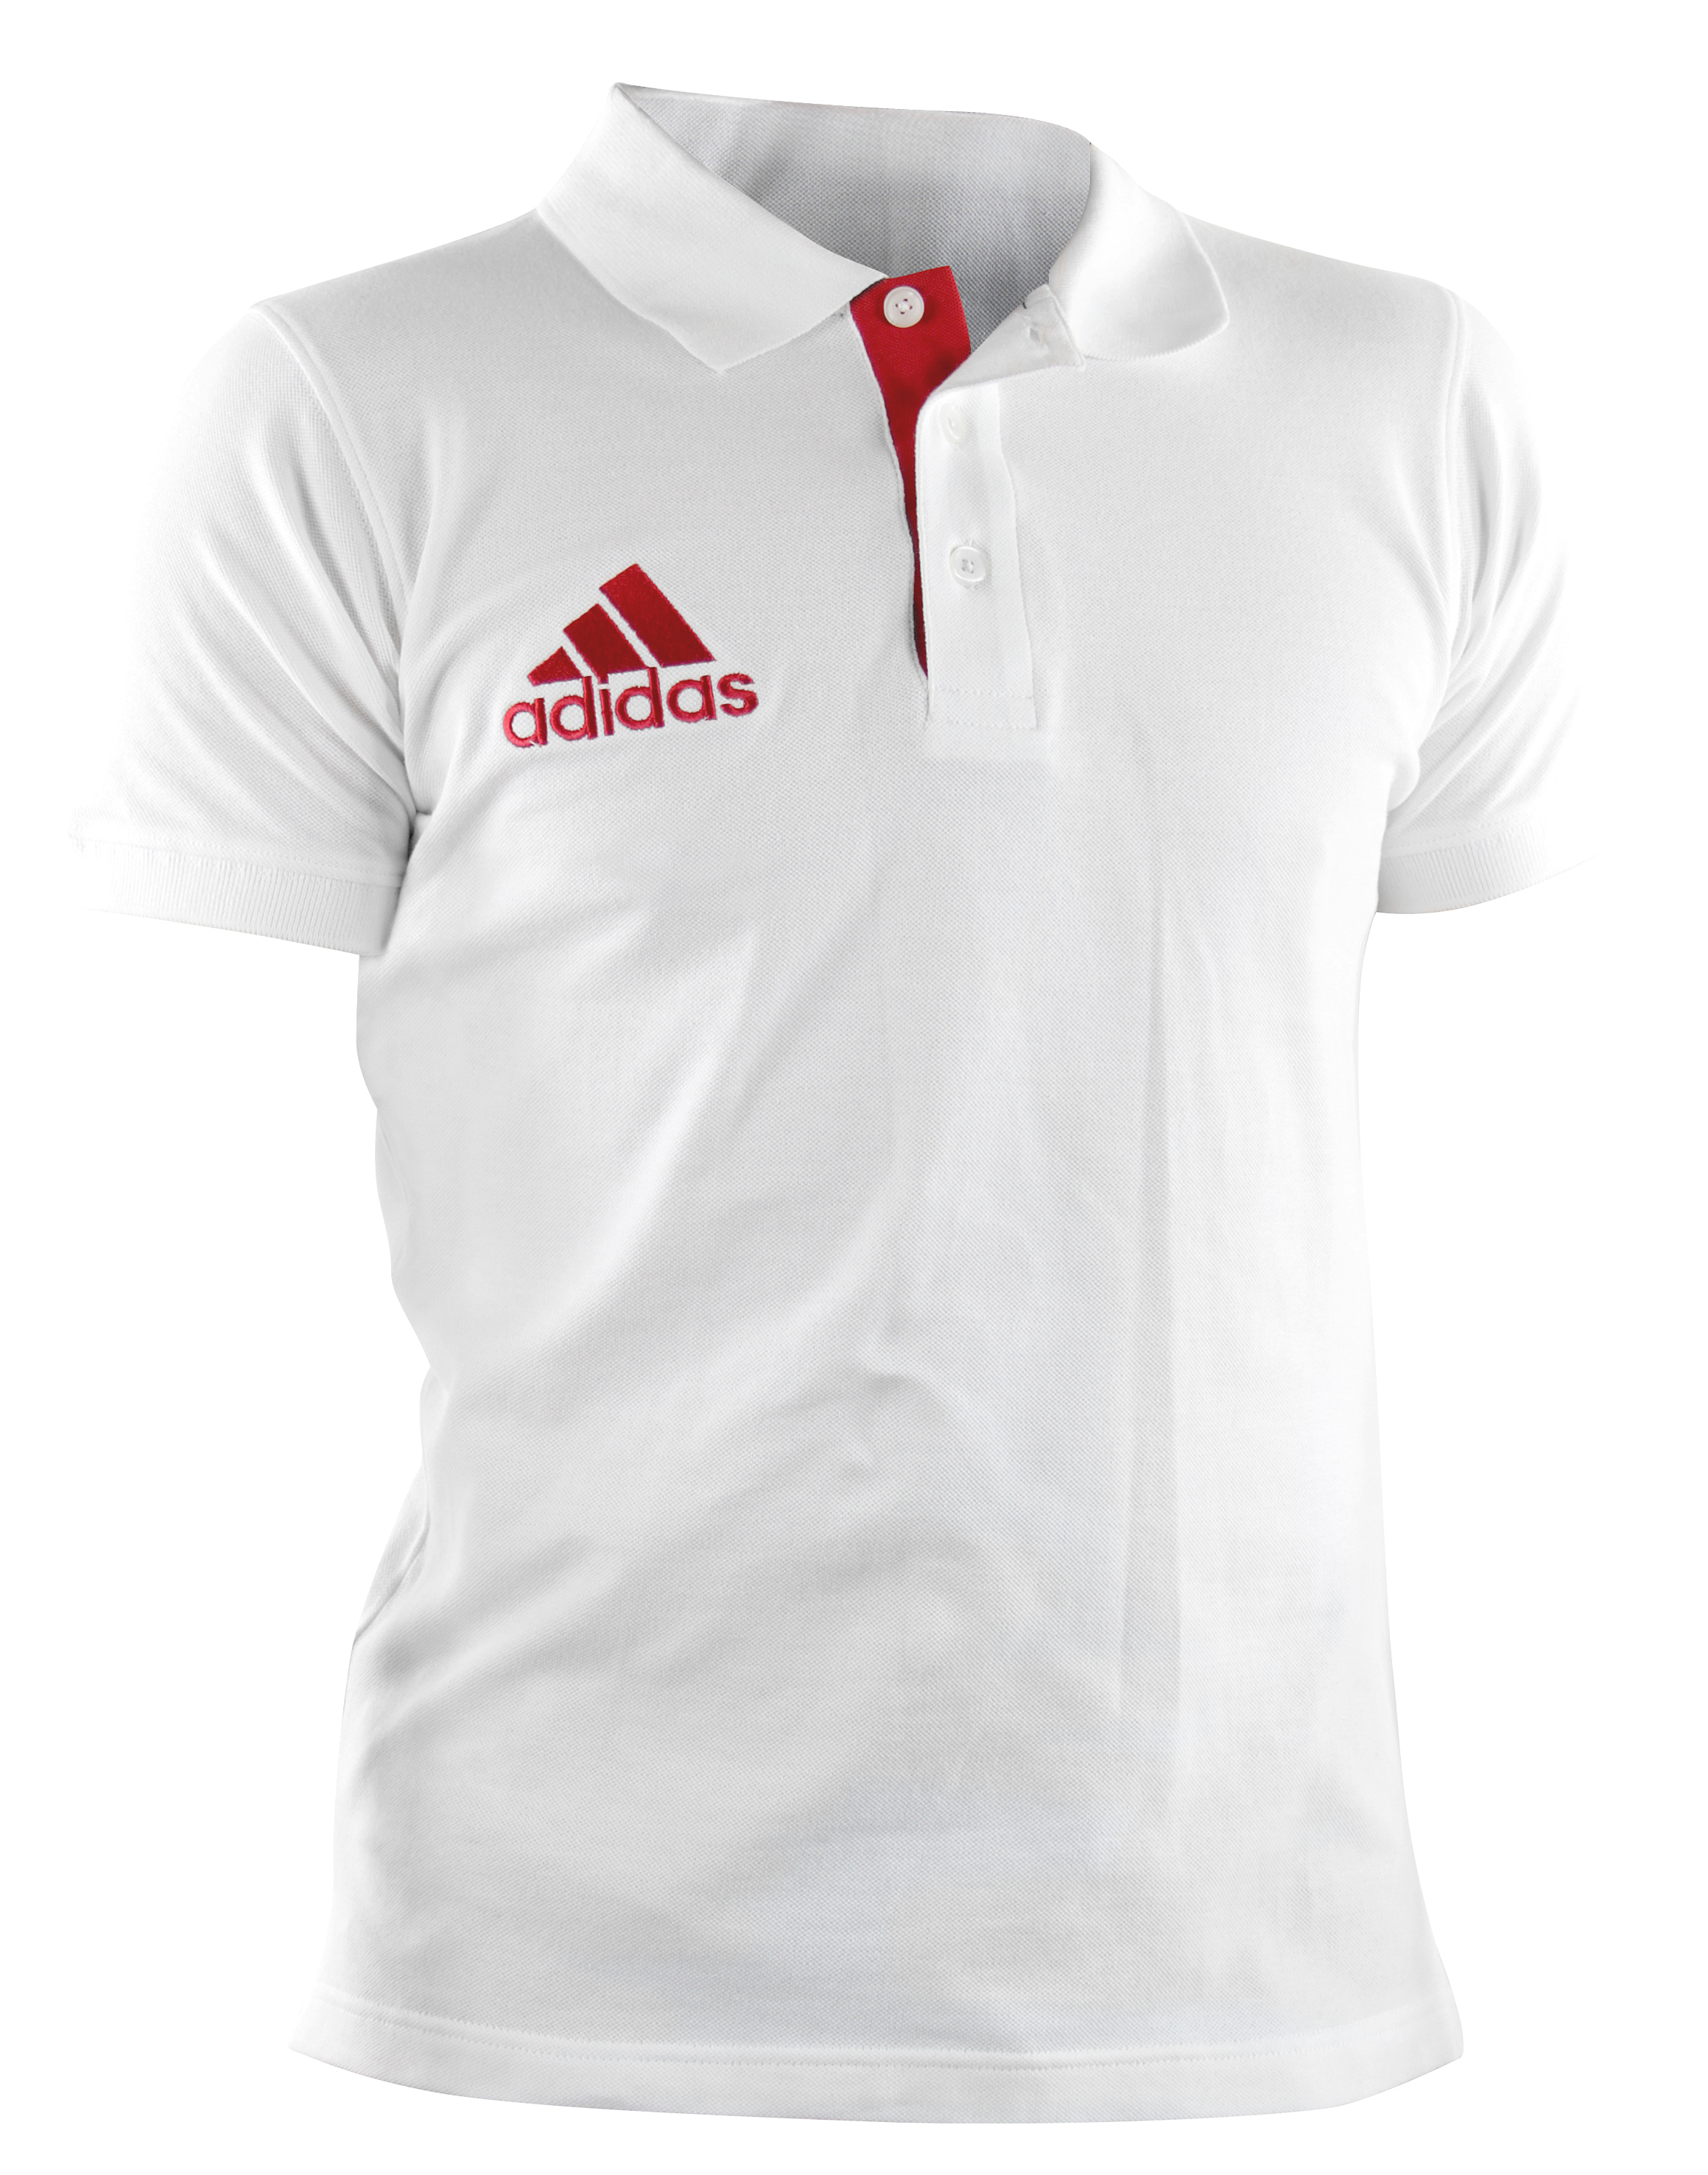 Image of   Adidas Pique Polo Shirt - Mænd - Hvid / Rød